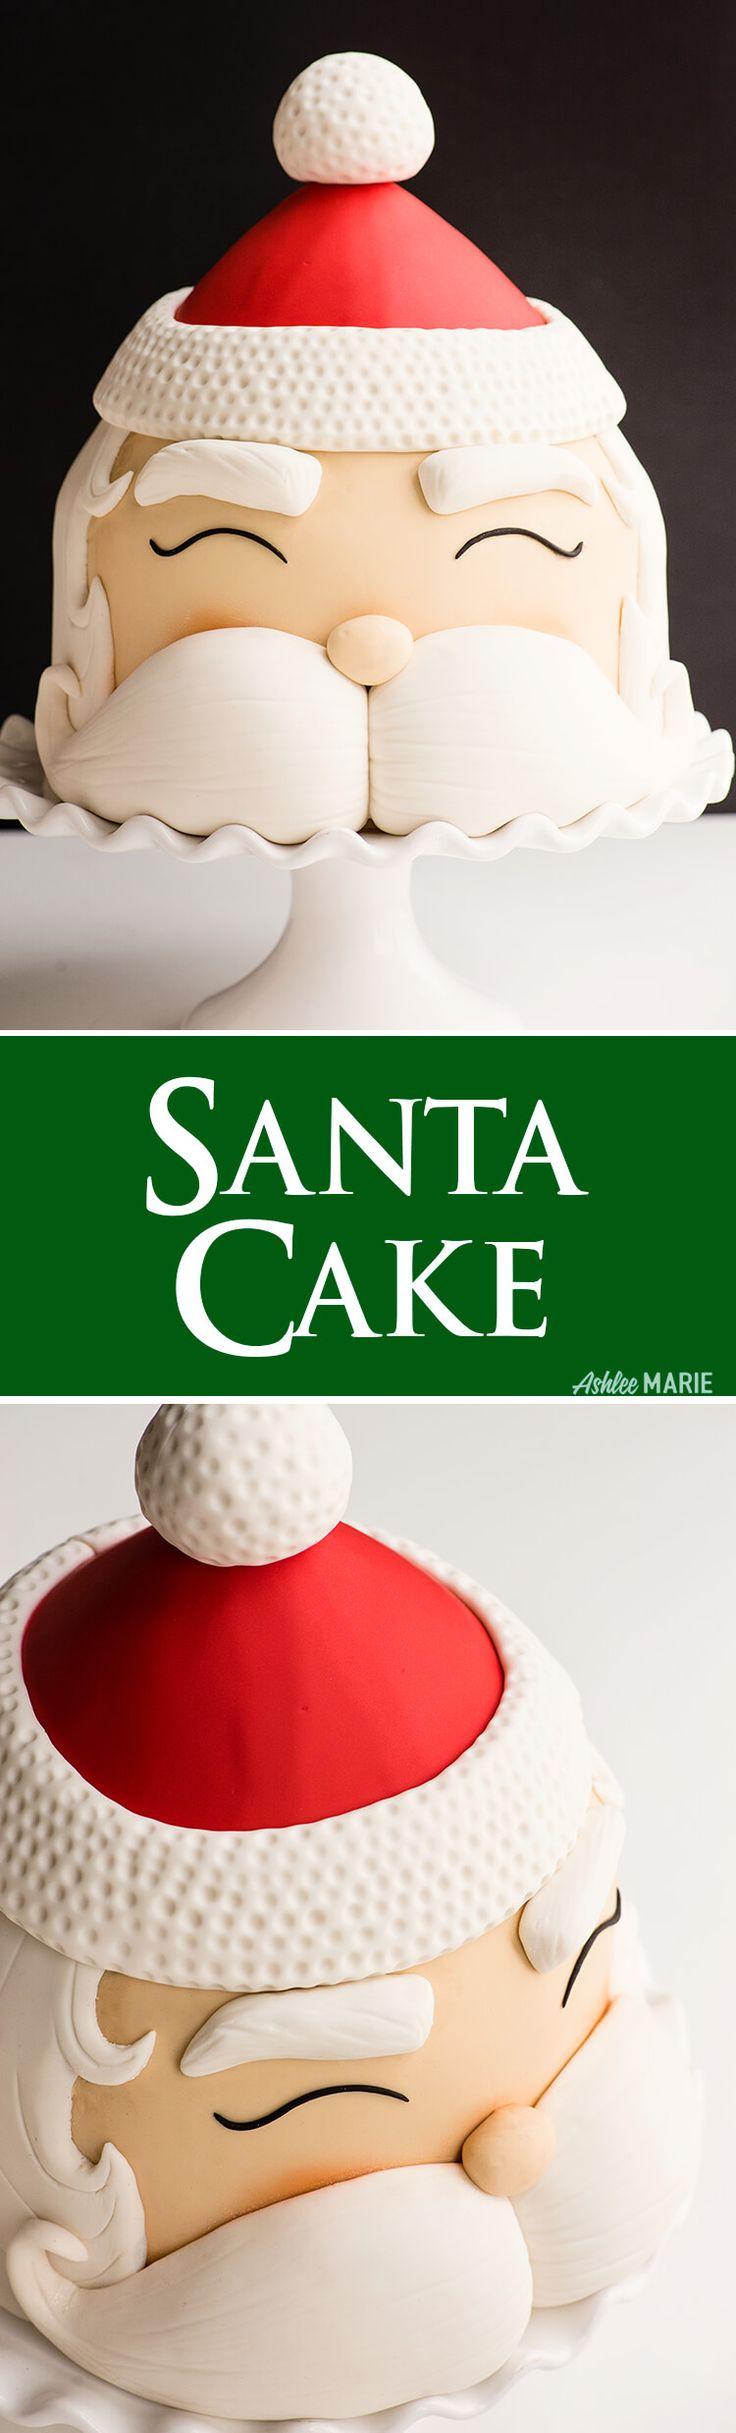 Easy Santa Cake with live video tutorial | Ashlee Marie | Winter | Christmas | Holiday | Santa Cake | Cake Tutorial | #santacake #santacaketutorial #caketutorial #holidaycake #christmascake